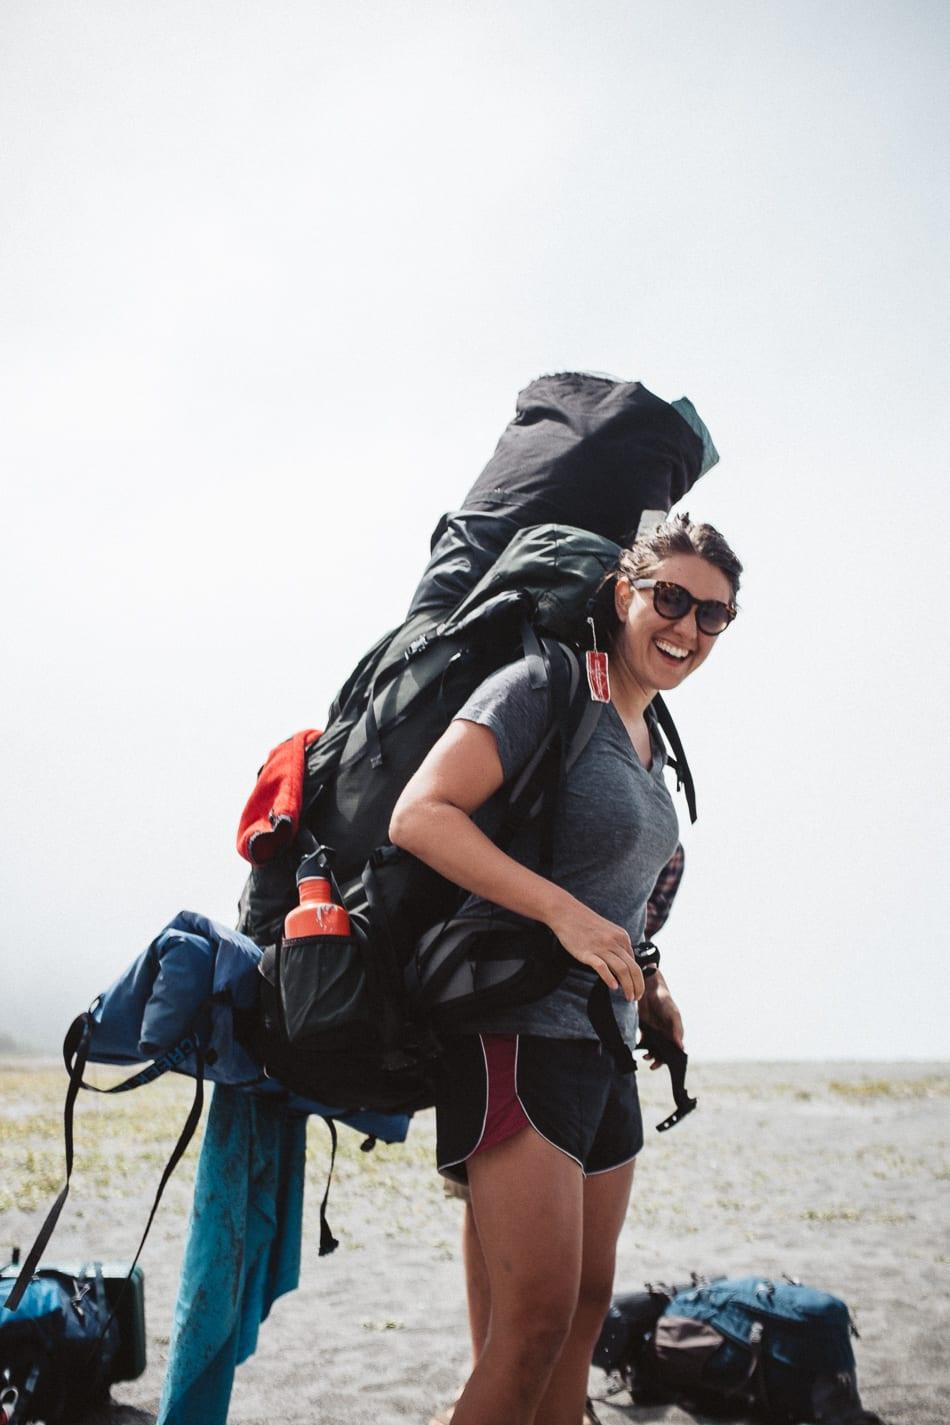 patricks-point-beach-camping-california-adventure-photographer-23